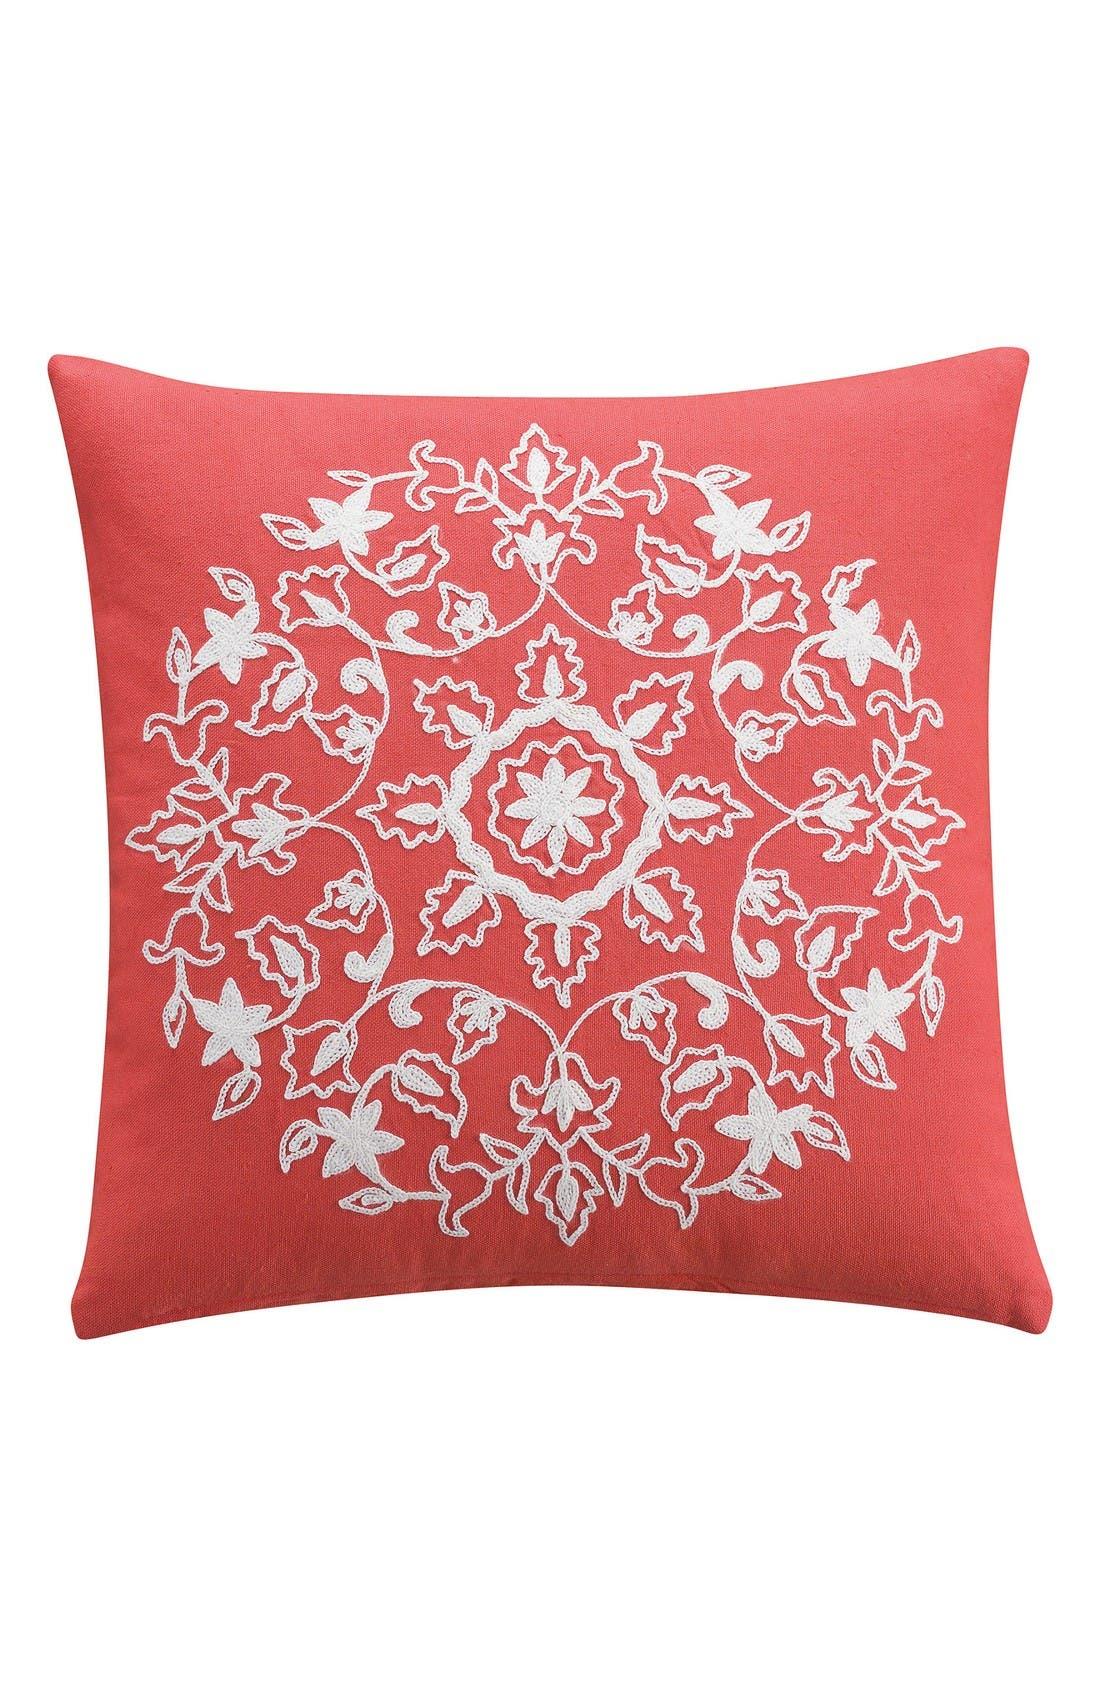 KAS Designs Casbah Medallion Pillow